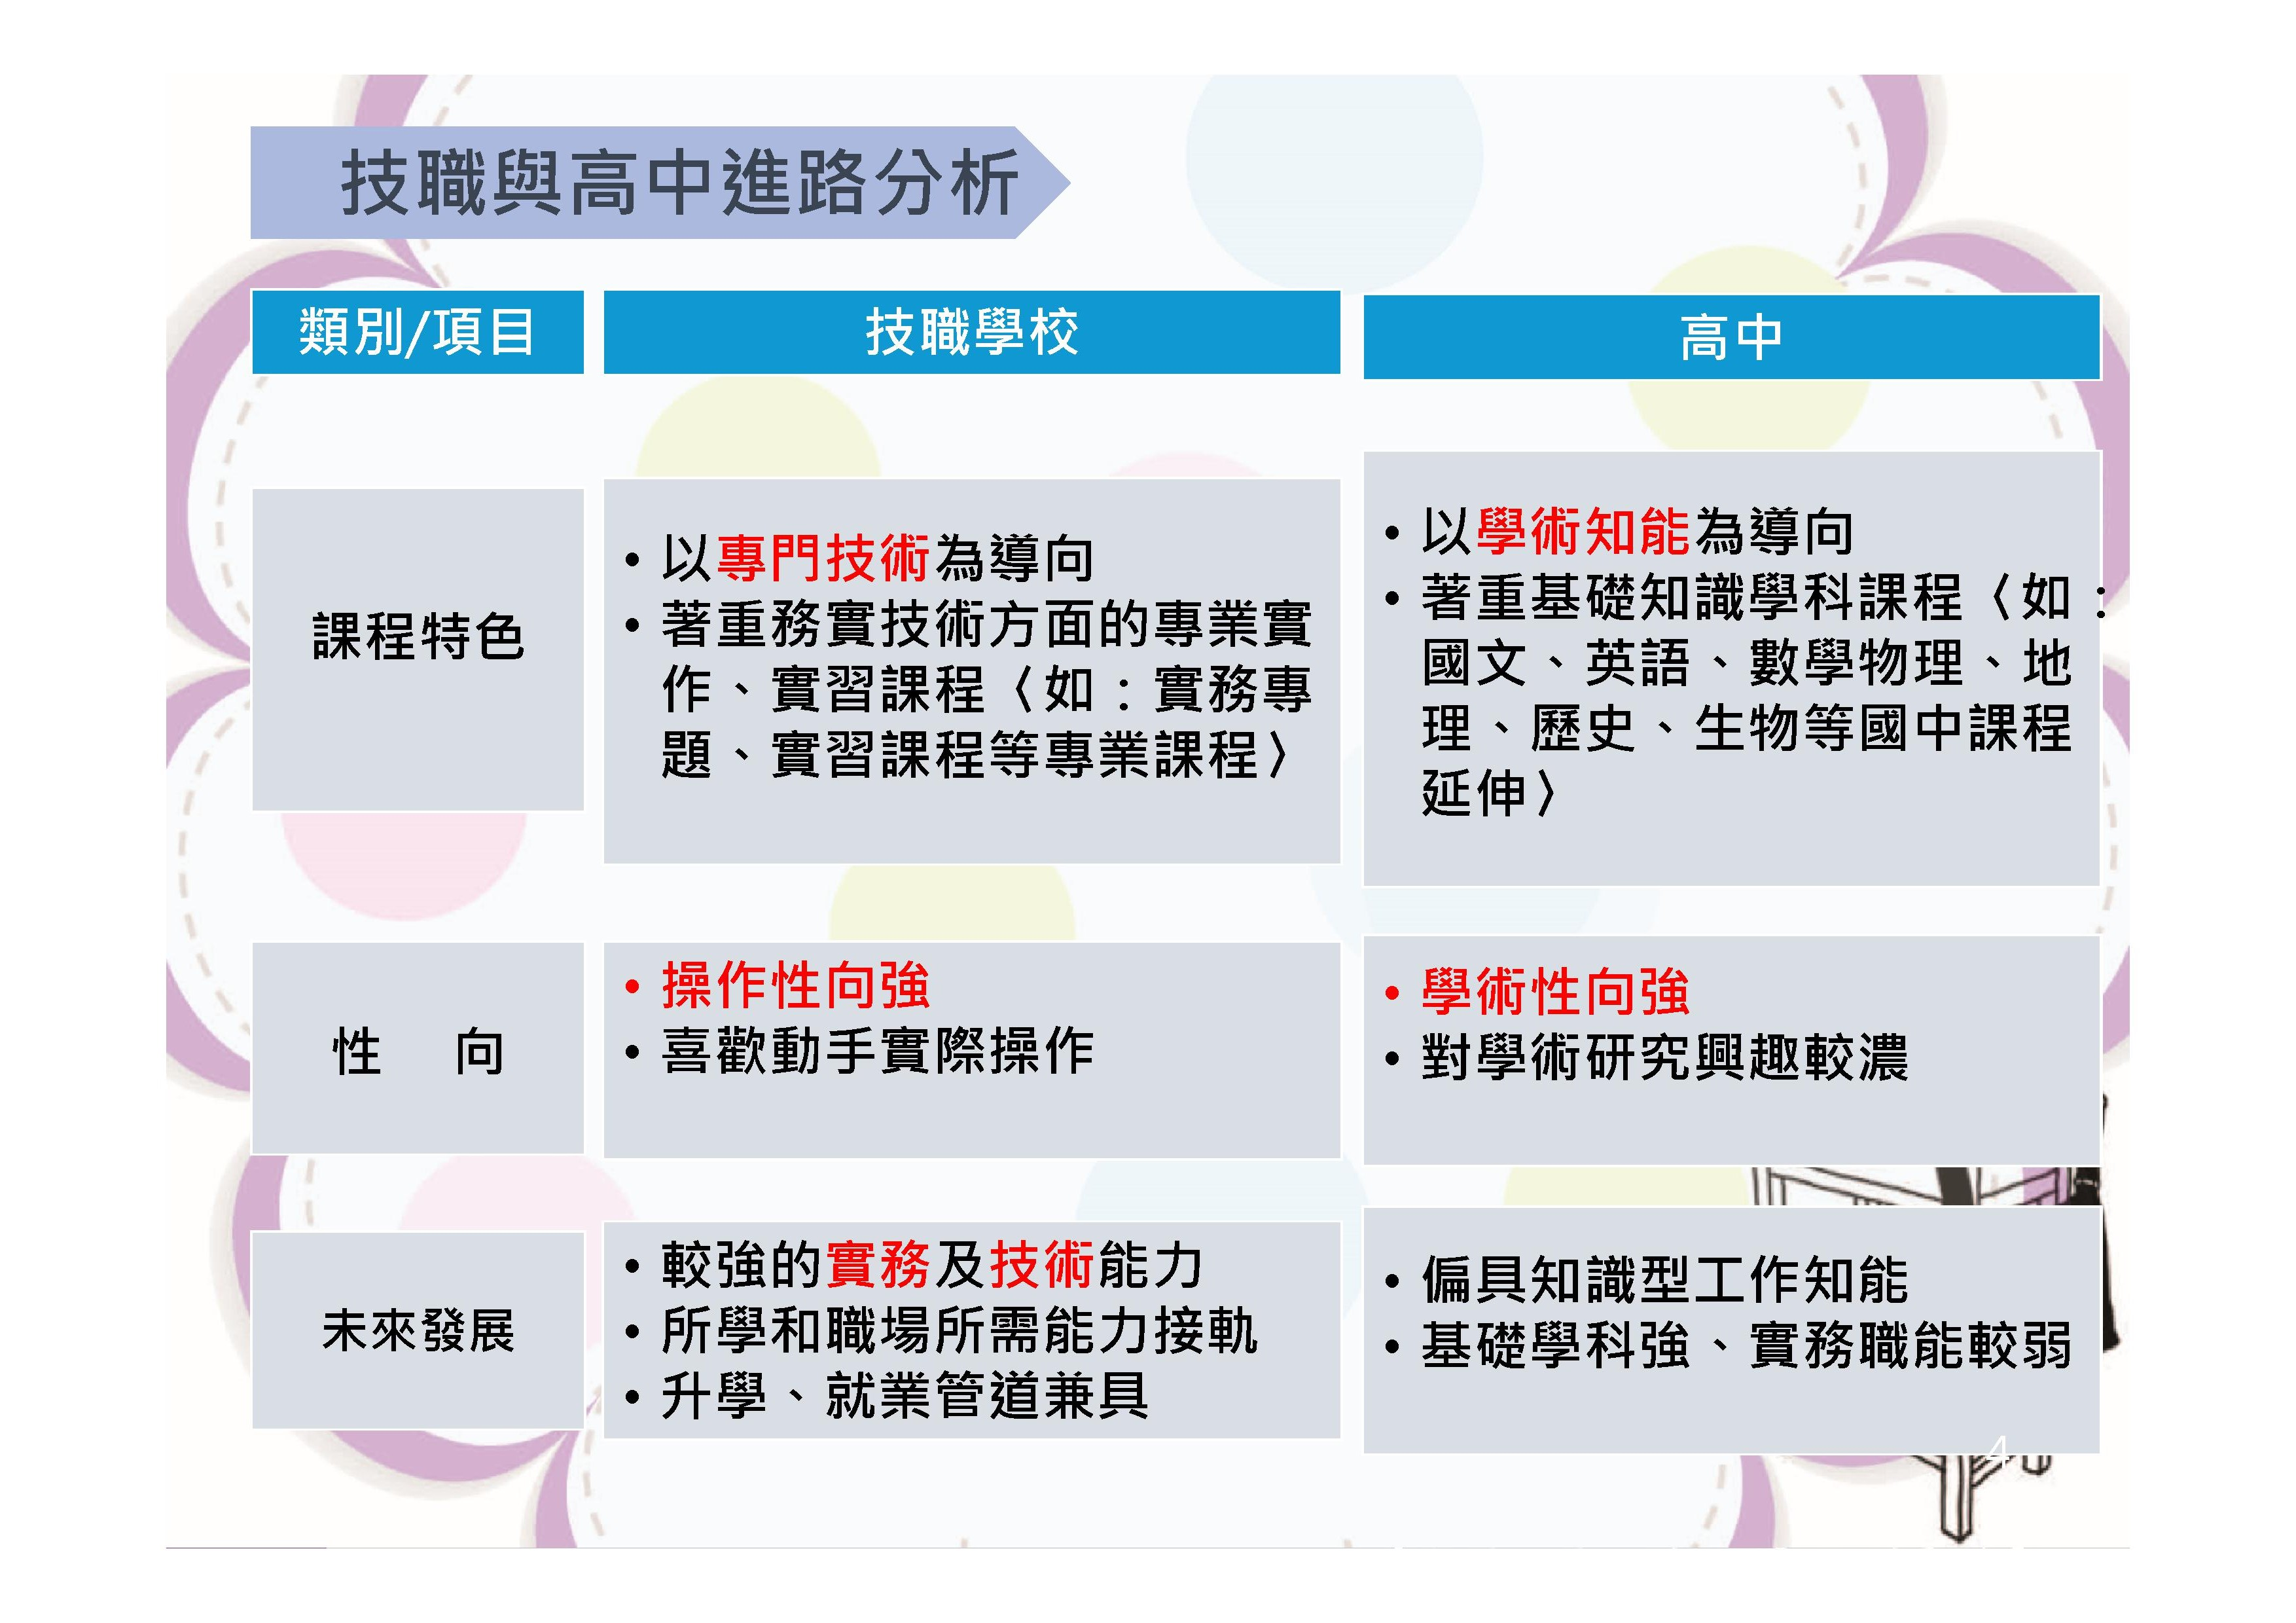 Microsoft PowerPoint - 技職教育暨士商簡介.pptx0003